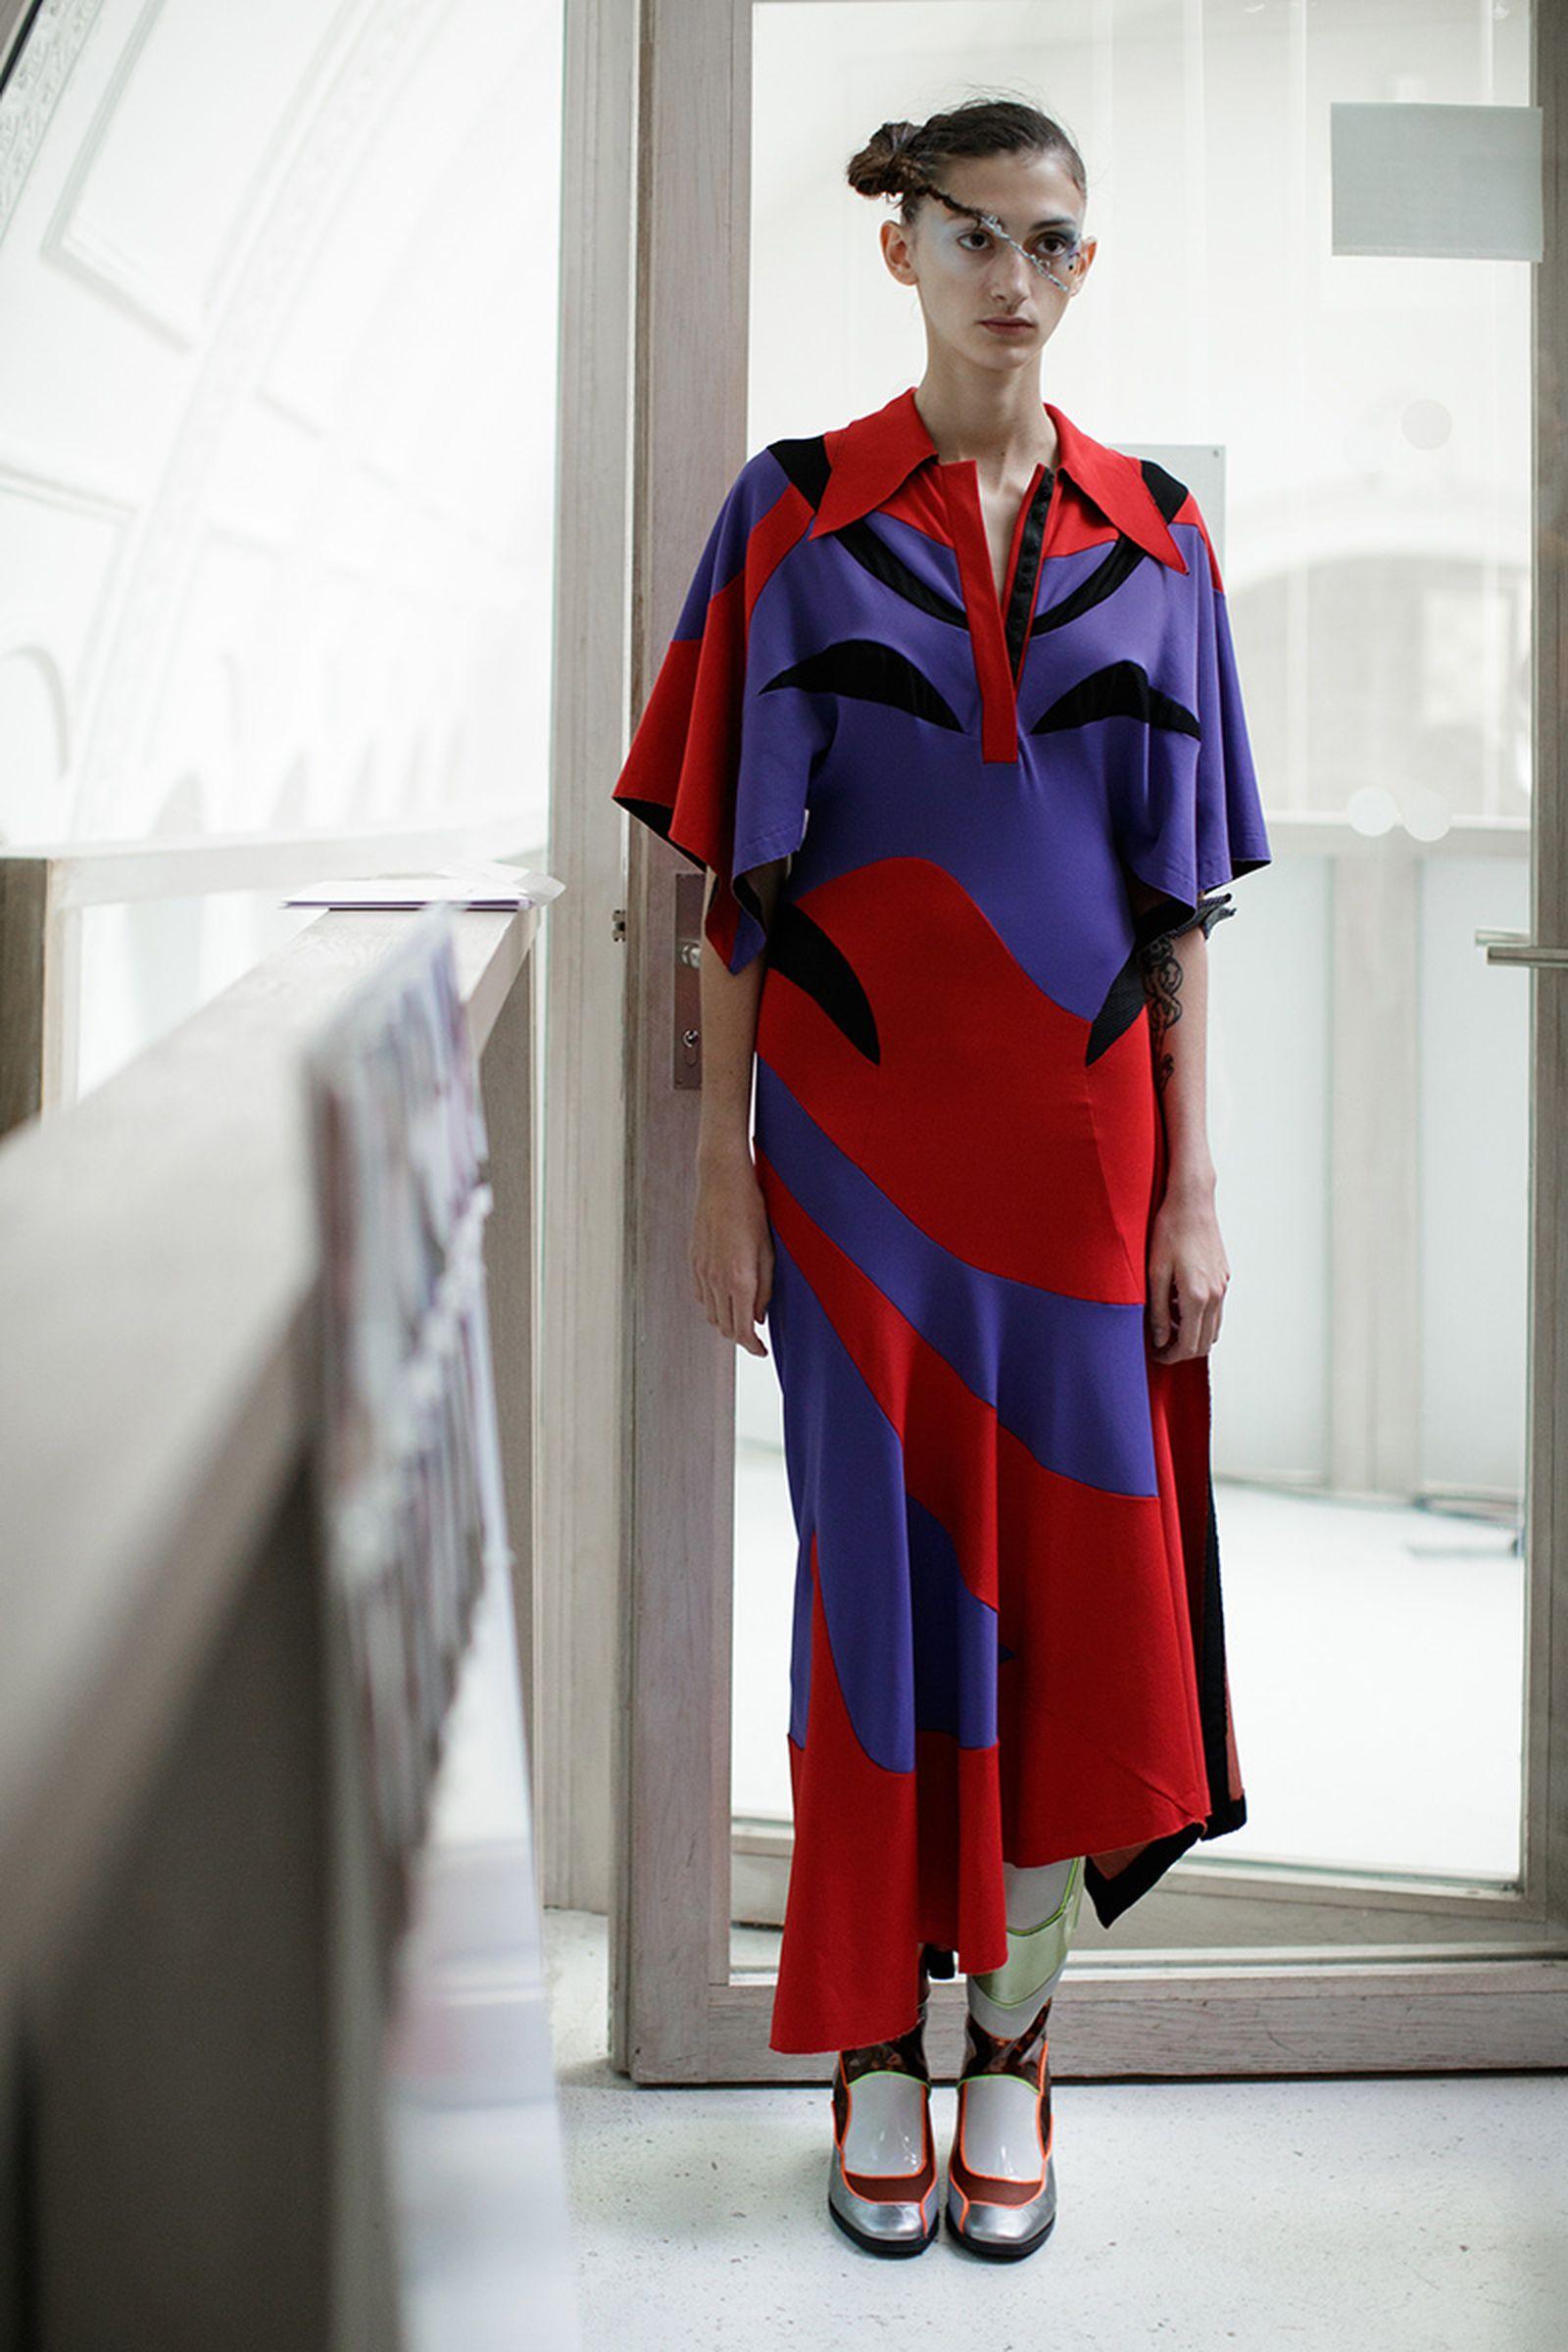 kiko kostadinov london fashion week3